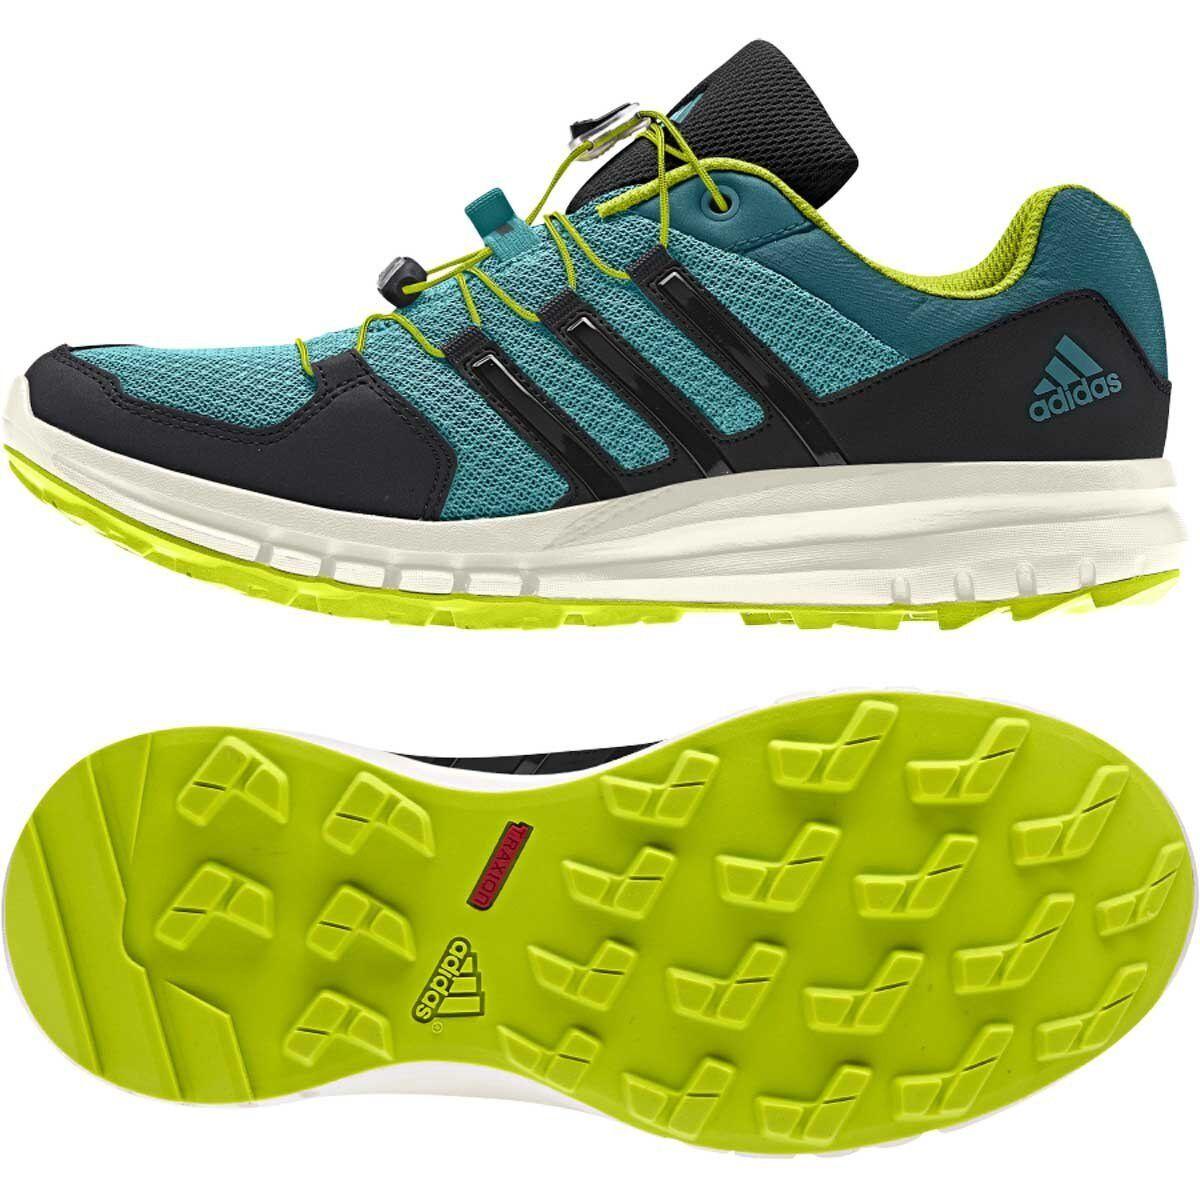 Nuevo en caja para mujeres Adidas Cruz X terrein W Trail terrein X Zapatos M18952- roackadi Duramo ff1701